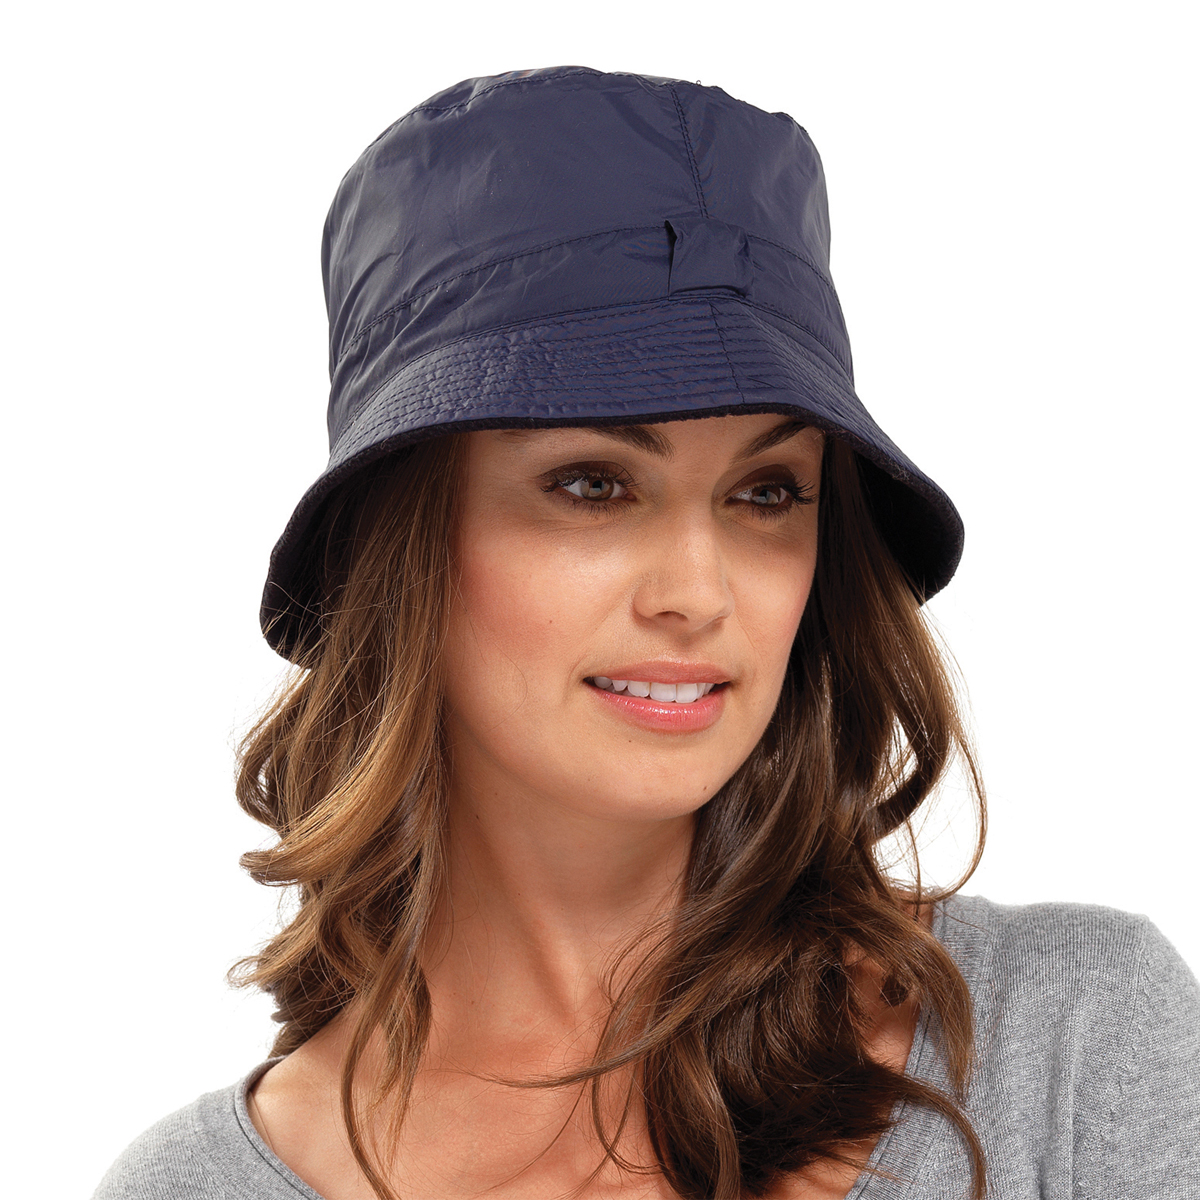 Waterproof bucket hat mens womens ladies casual country for Womens fishing hat